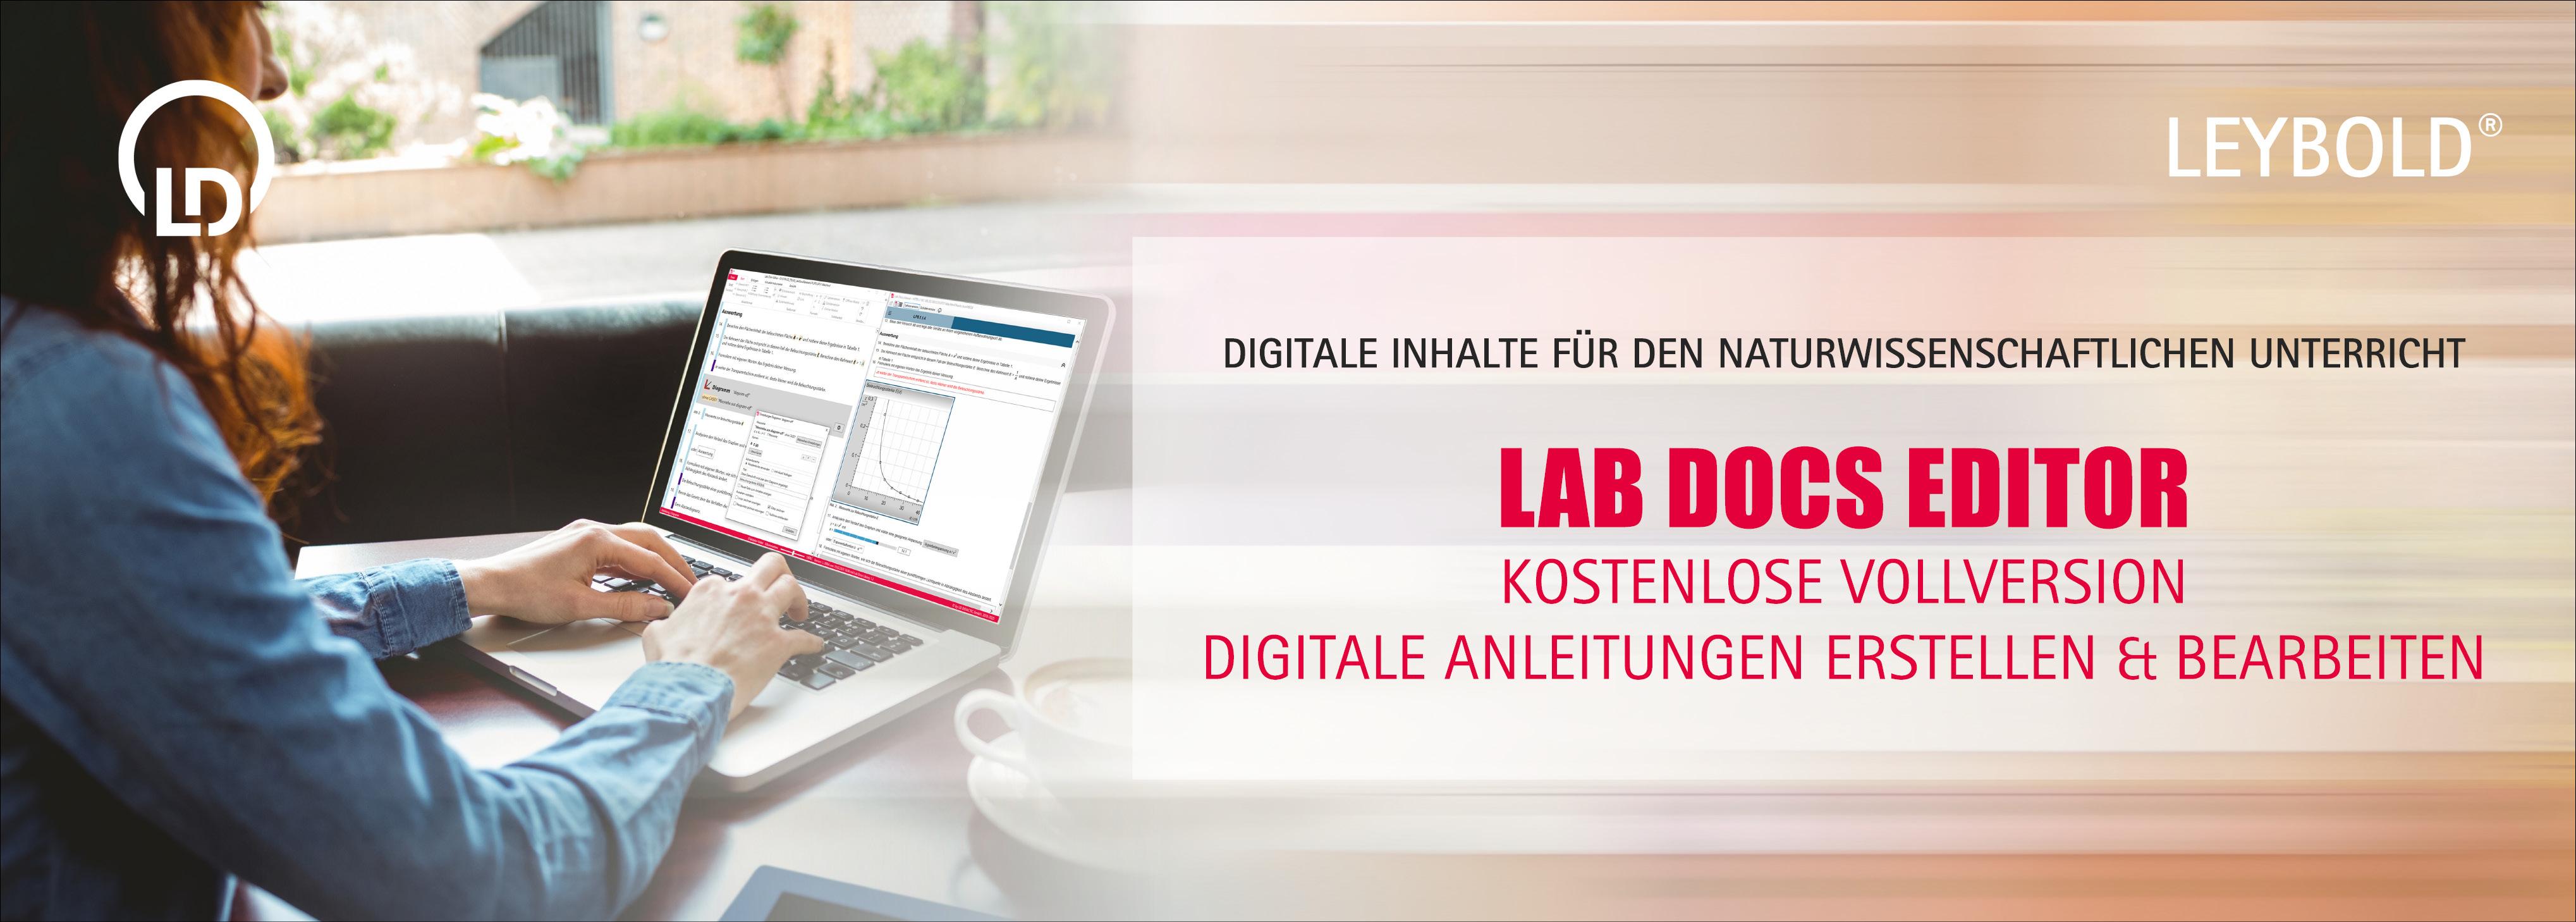 Lab Docs Editor Registrierung